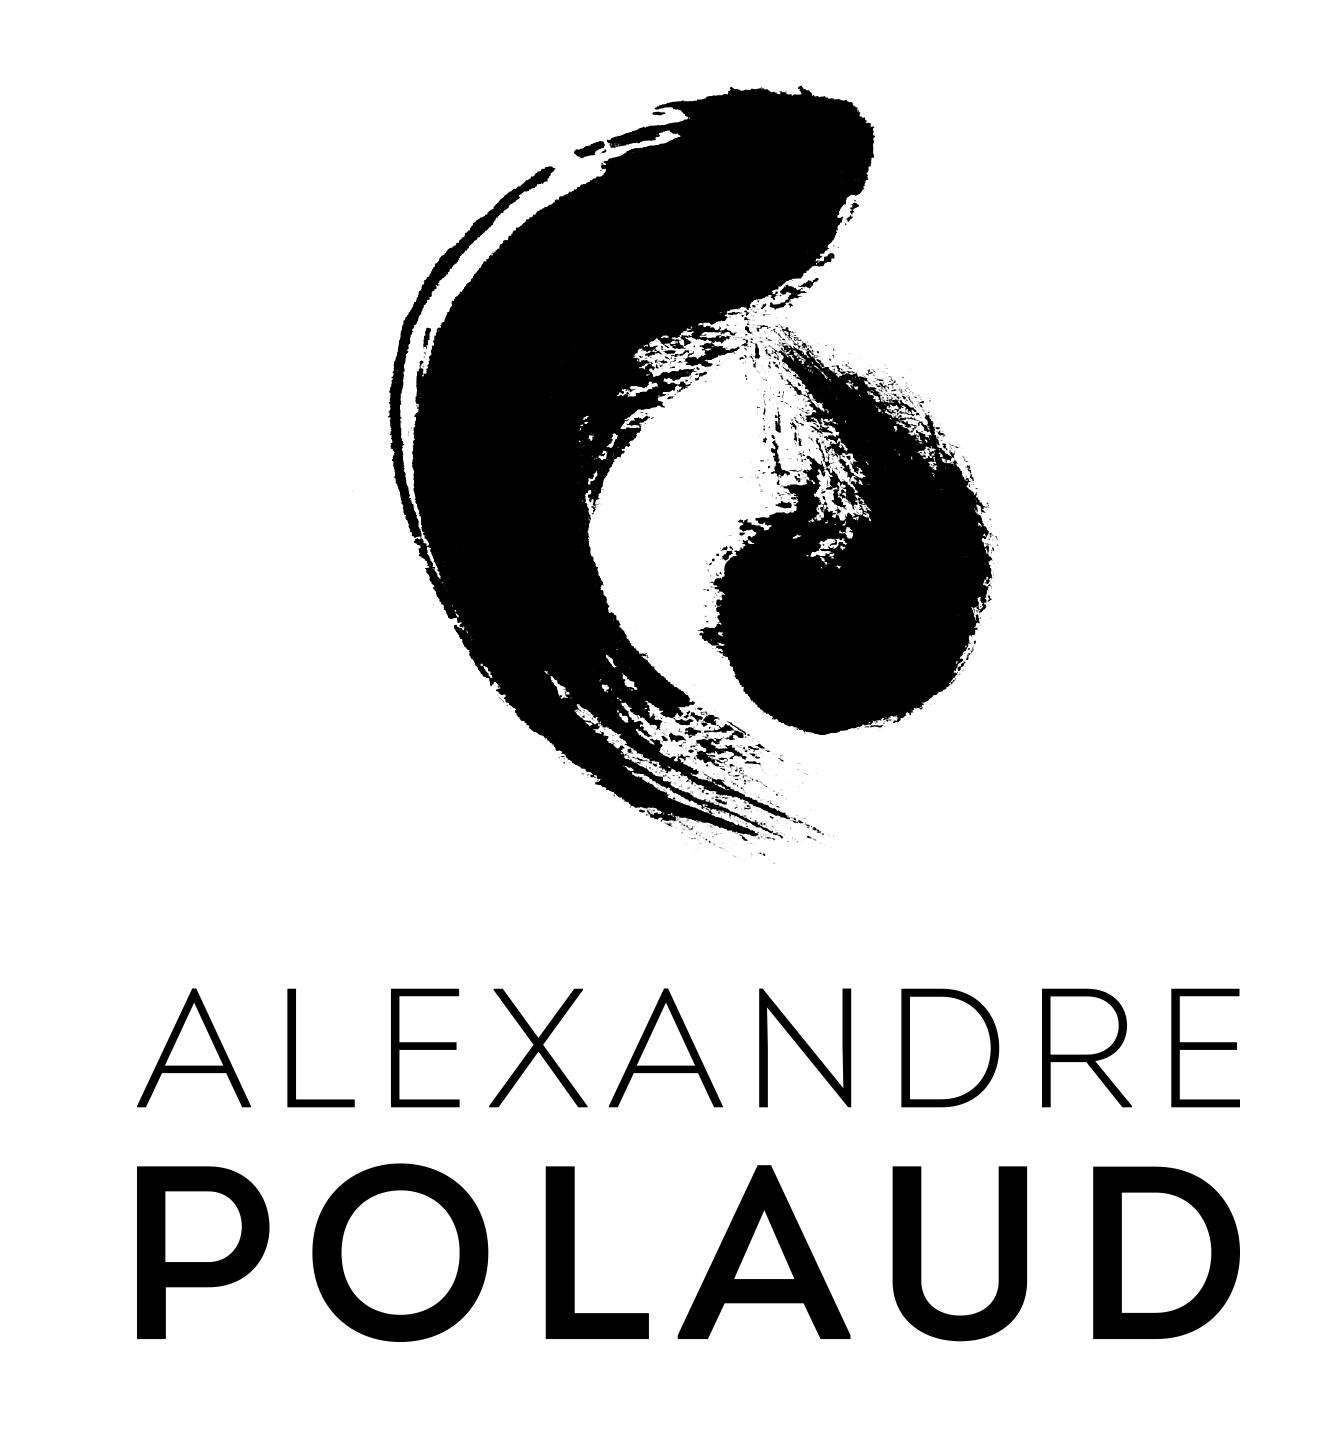 Alexandre Polaud